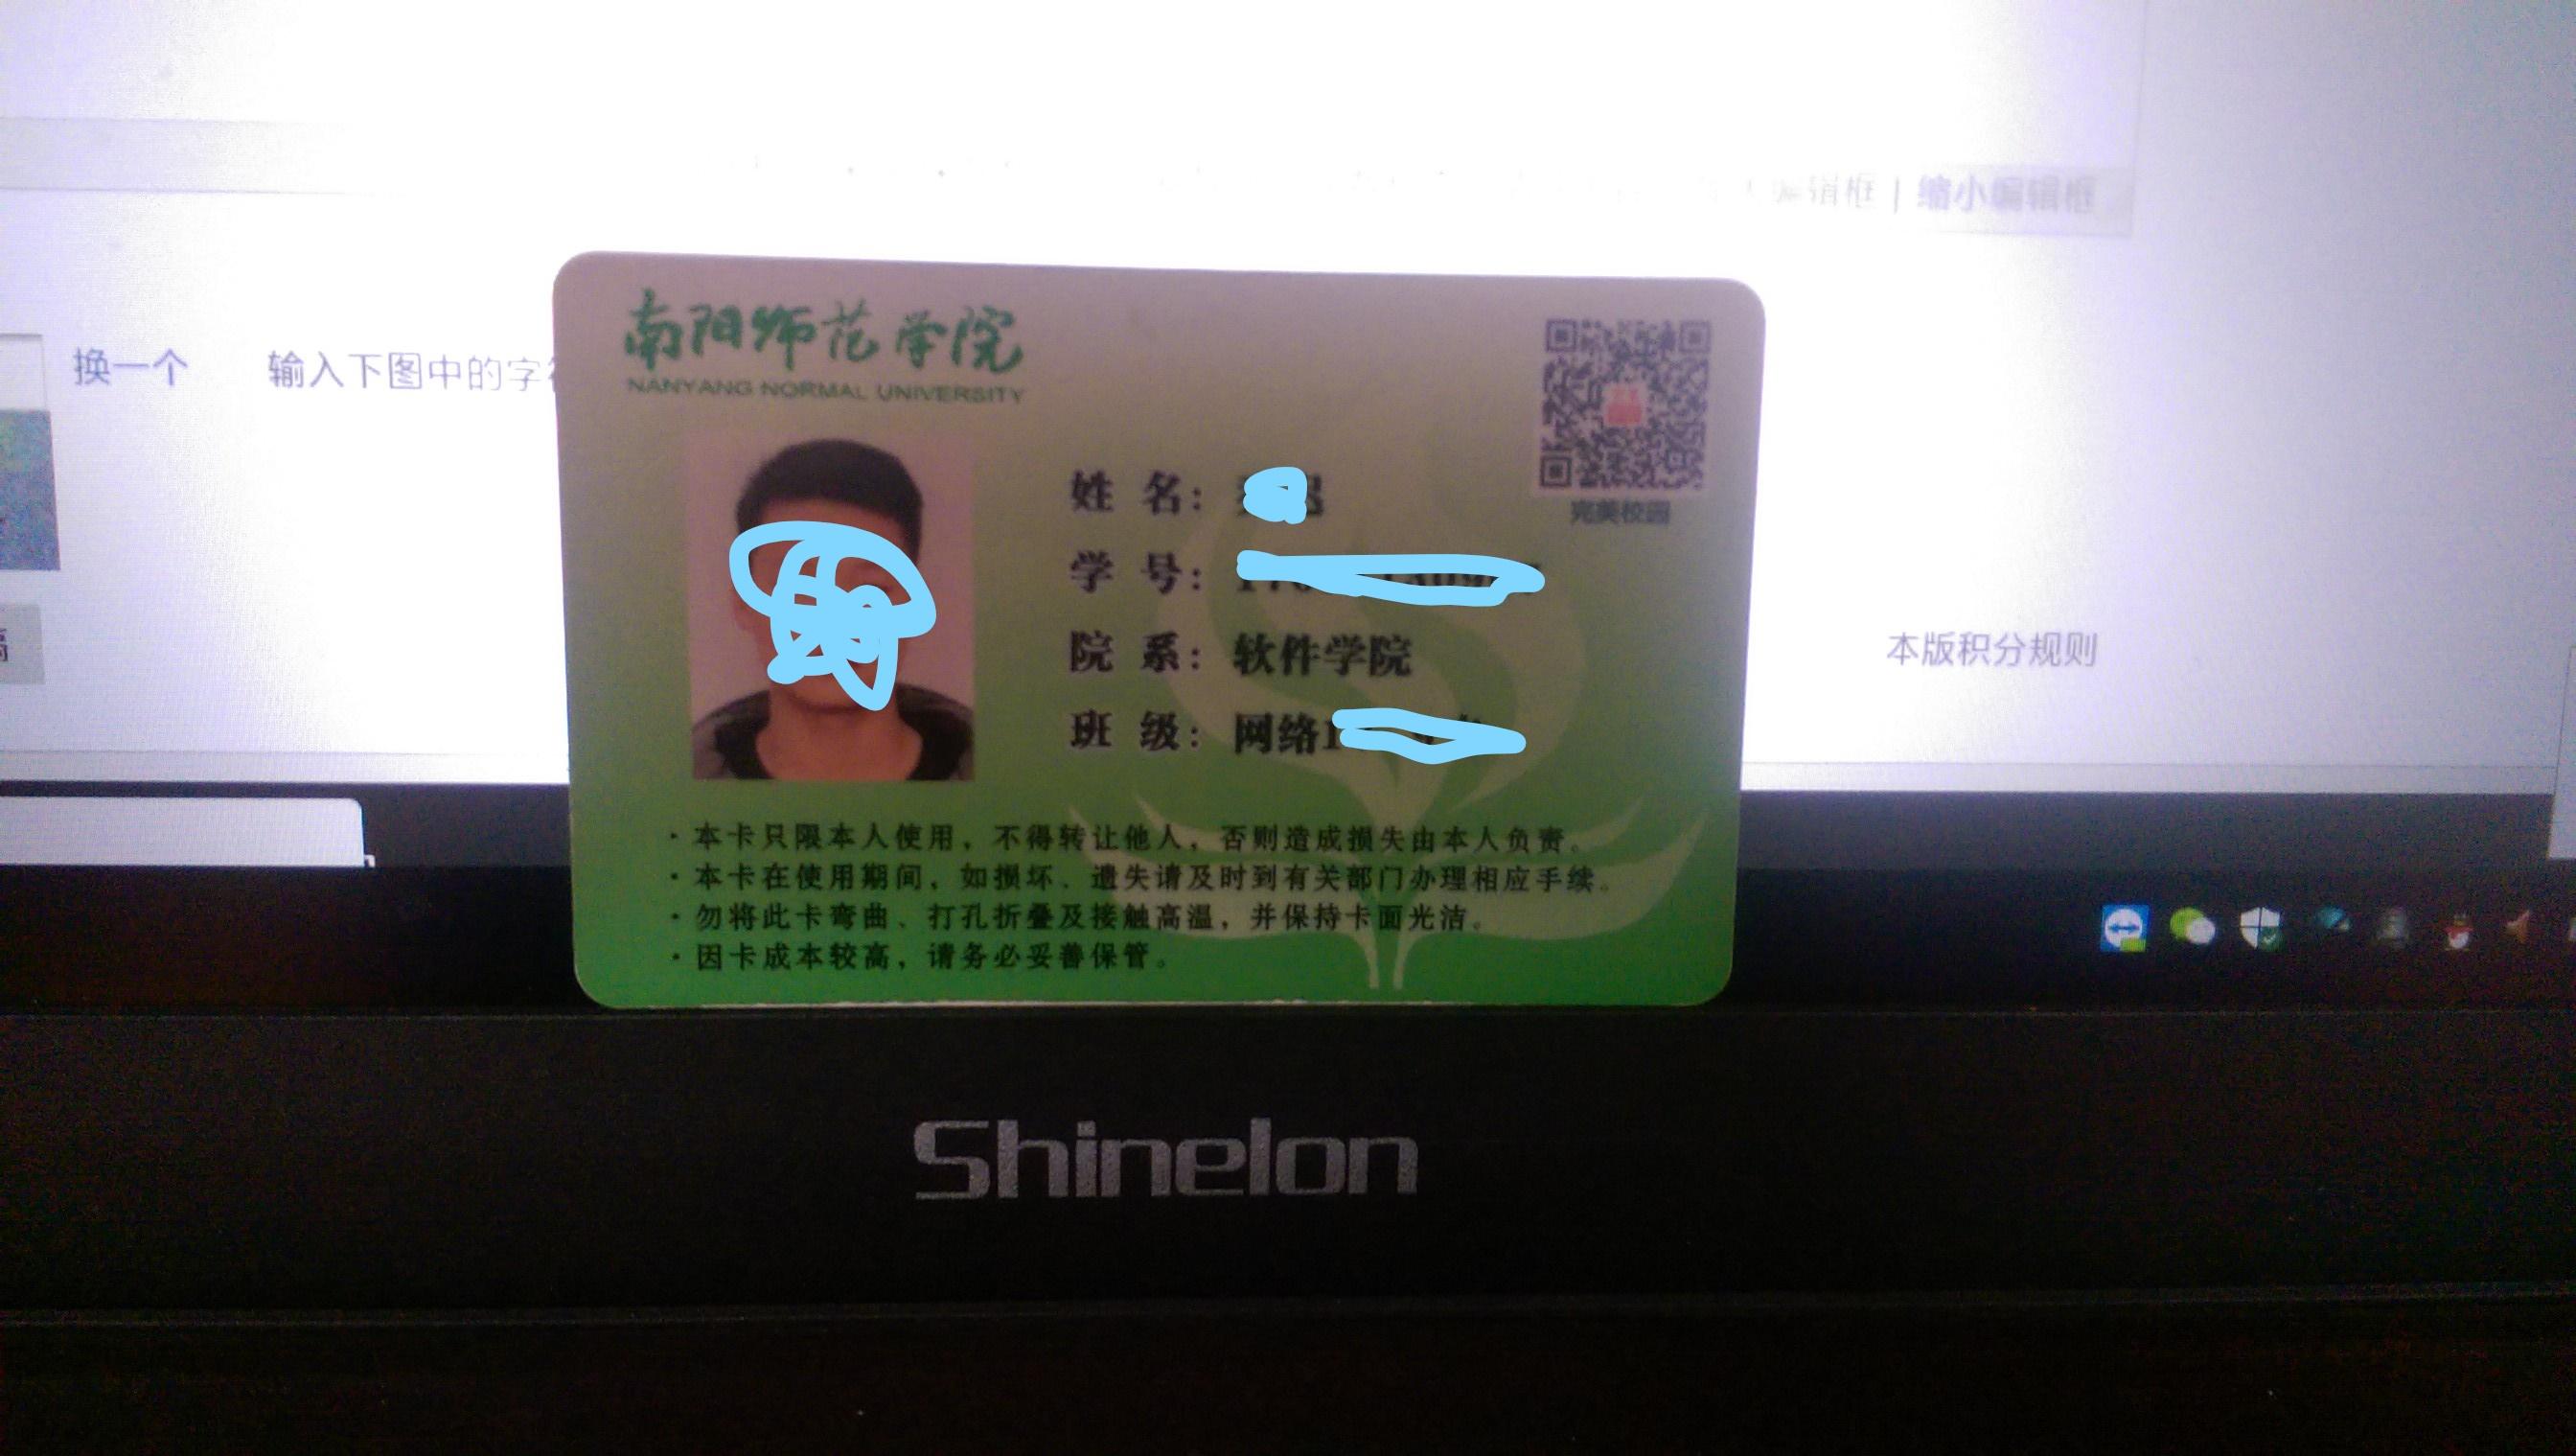 InkedSight_2017_11_30_092749_855_LI.jpg